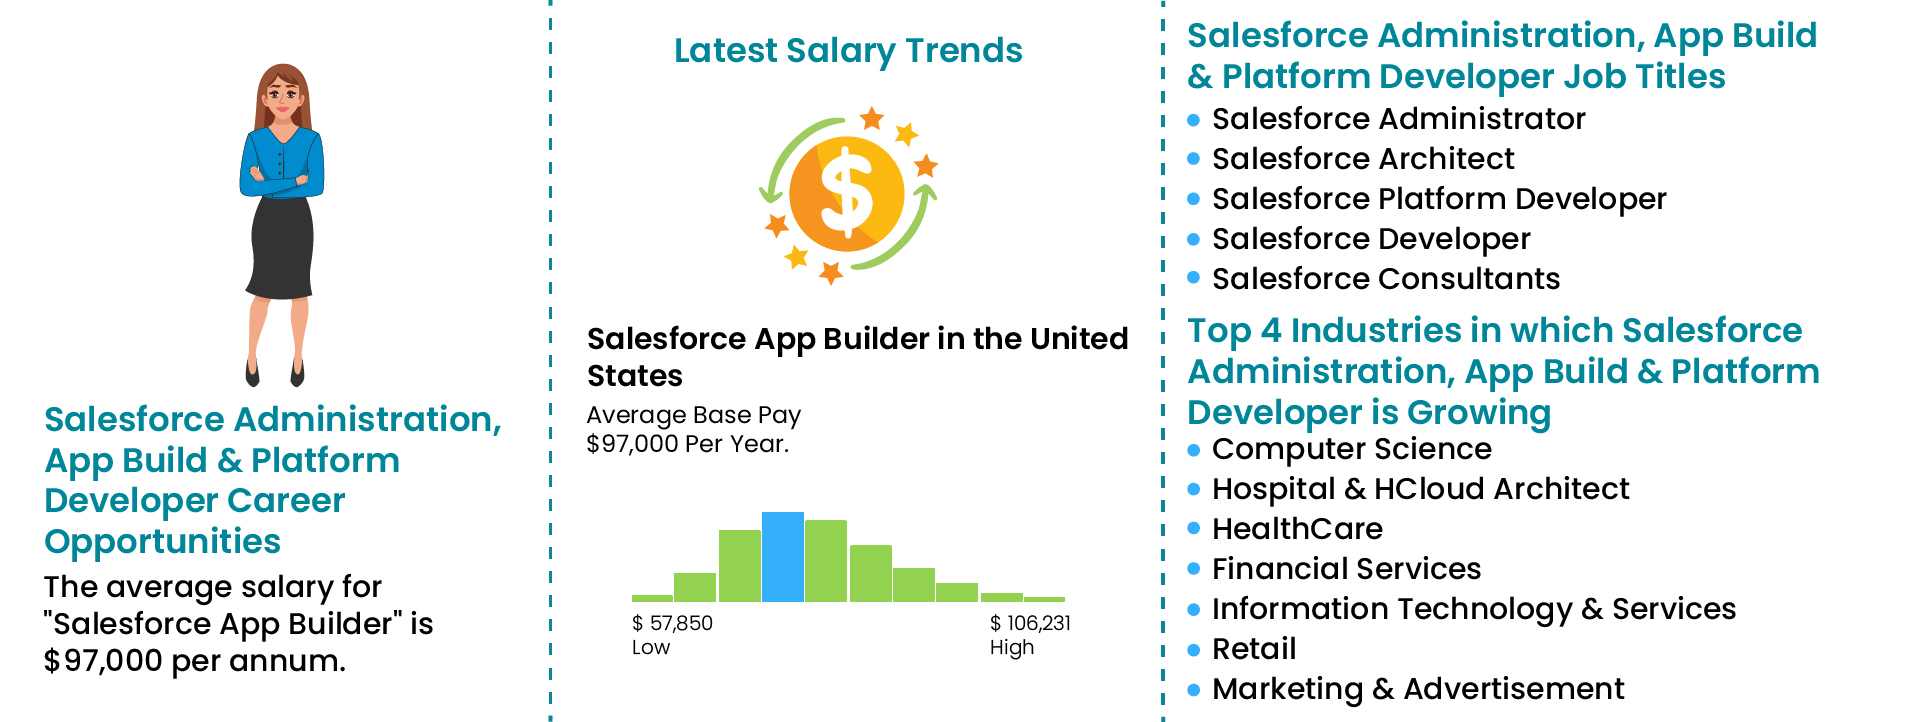 salesforce administration app and platform Training-Joboutlook|ZaranTech